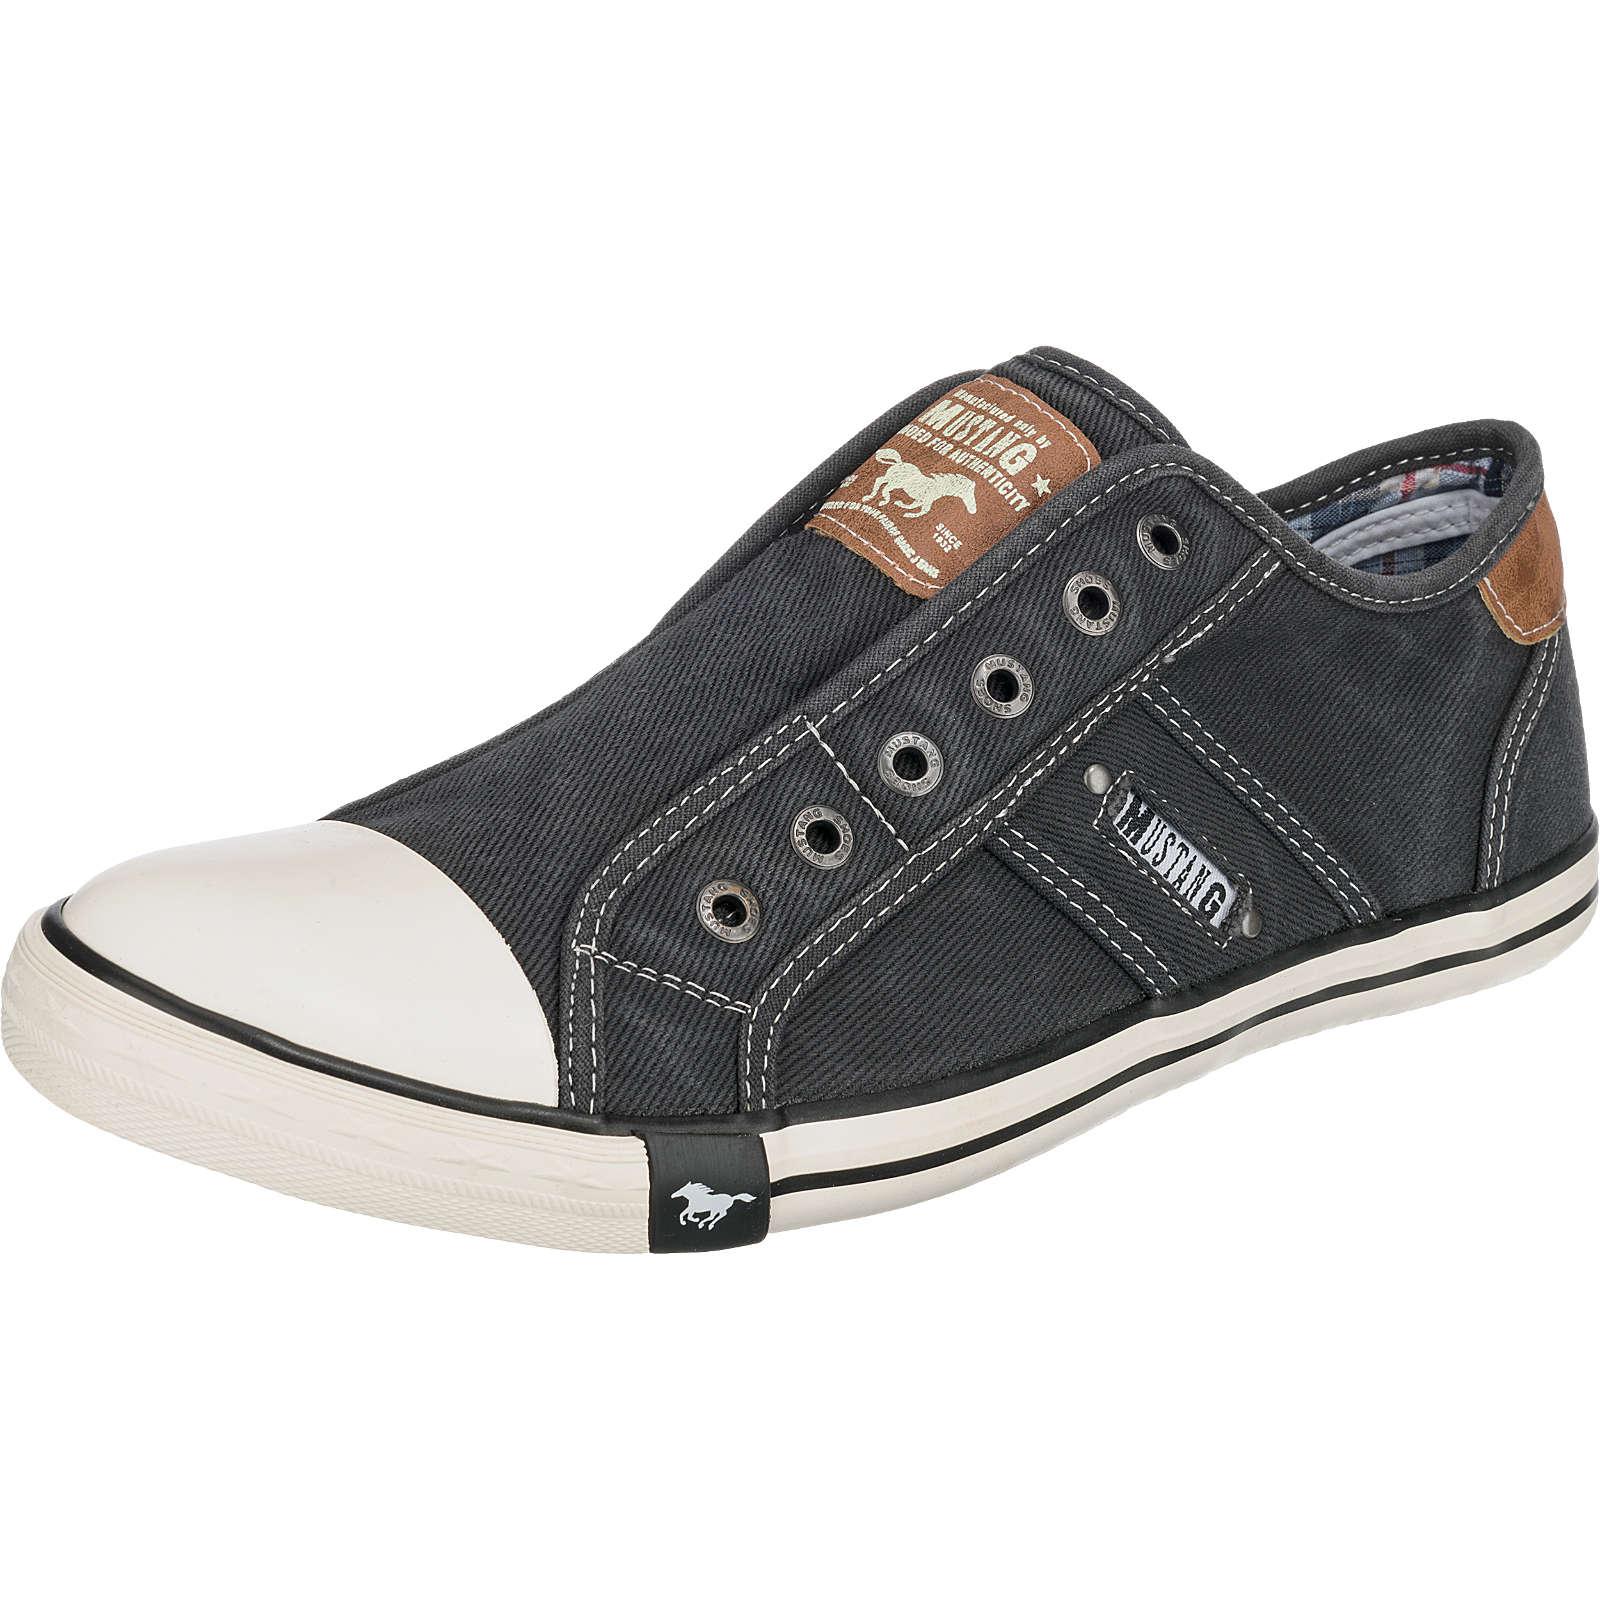 MUSTANG Slip-On-Sneaker schwarz Herren Gr. 42